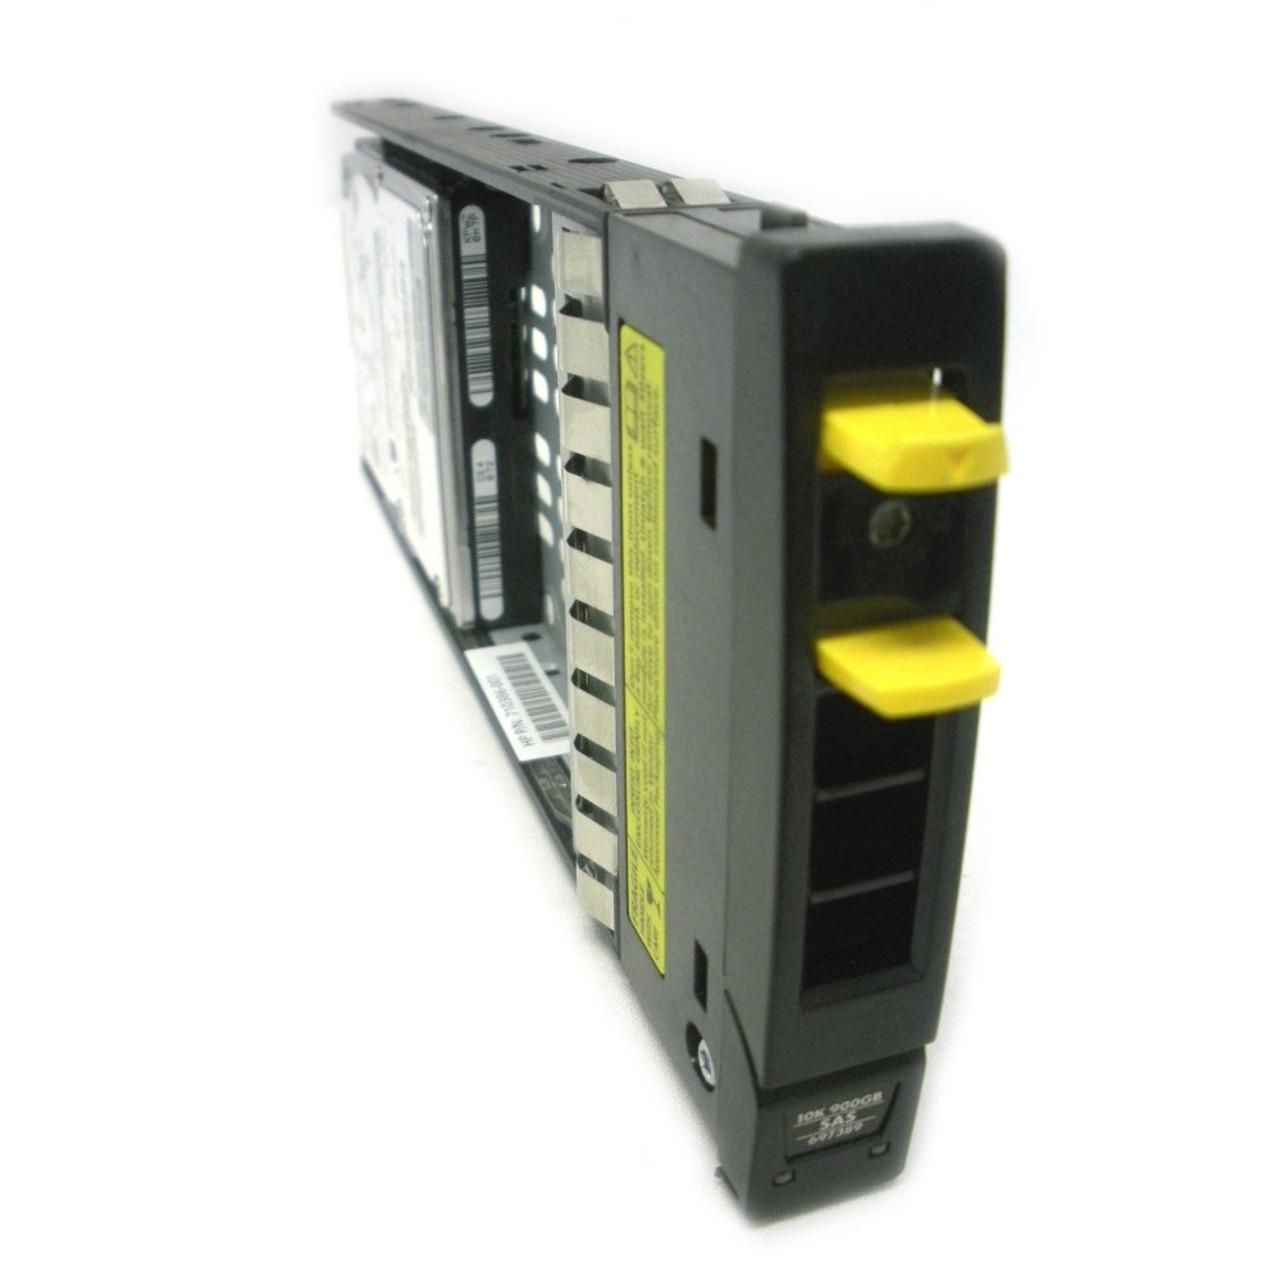 HPE 900GB SAS 6G ENTERPRISE 10K SFF 2.5IN HARD DRIVE 619291-B21 619463-001